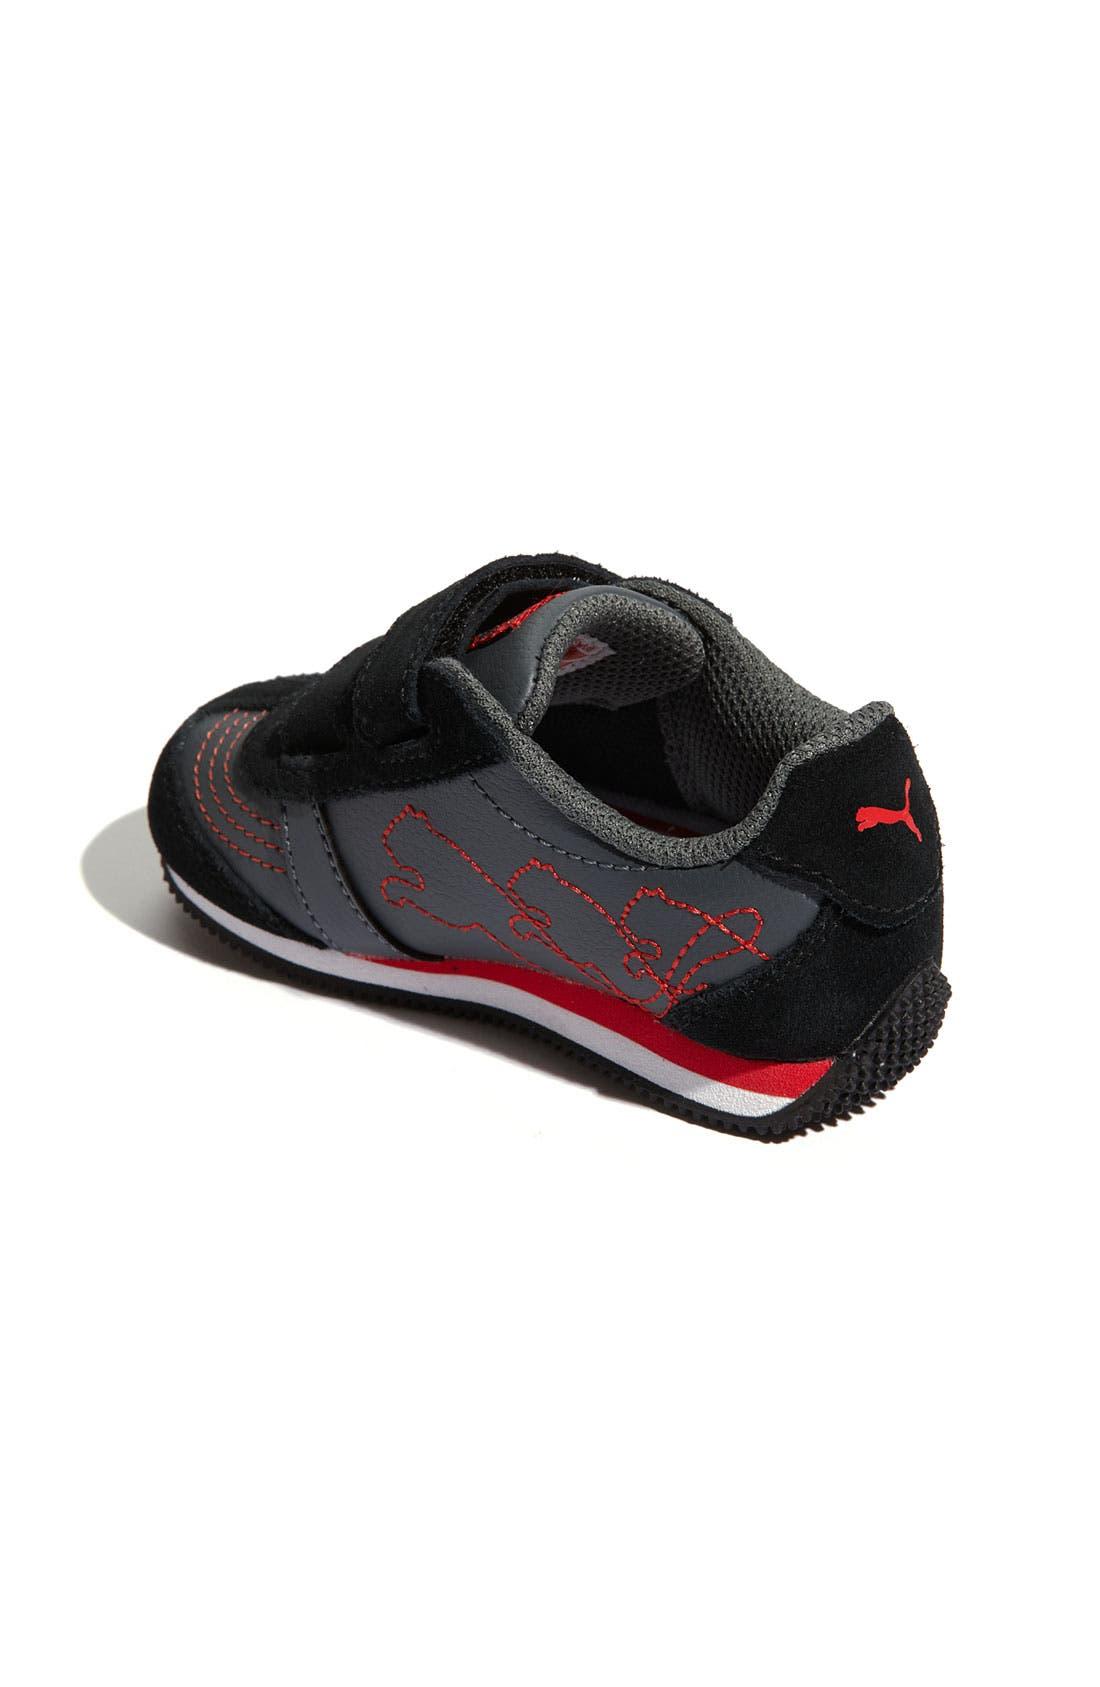 Alternate Image 2  - PUMA 'Speeder Illuminescent' Sneaker (Baby, Walker & Toddler)